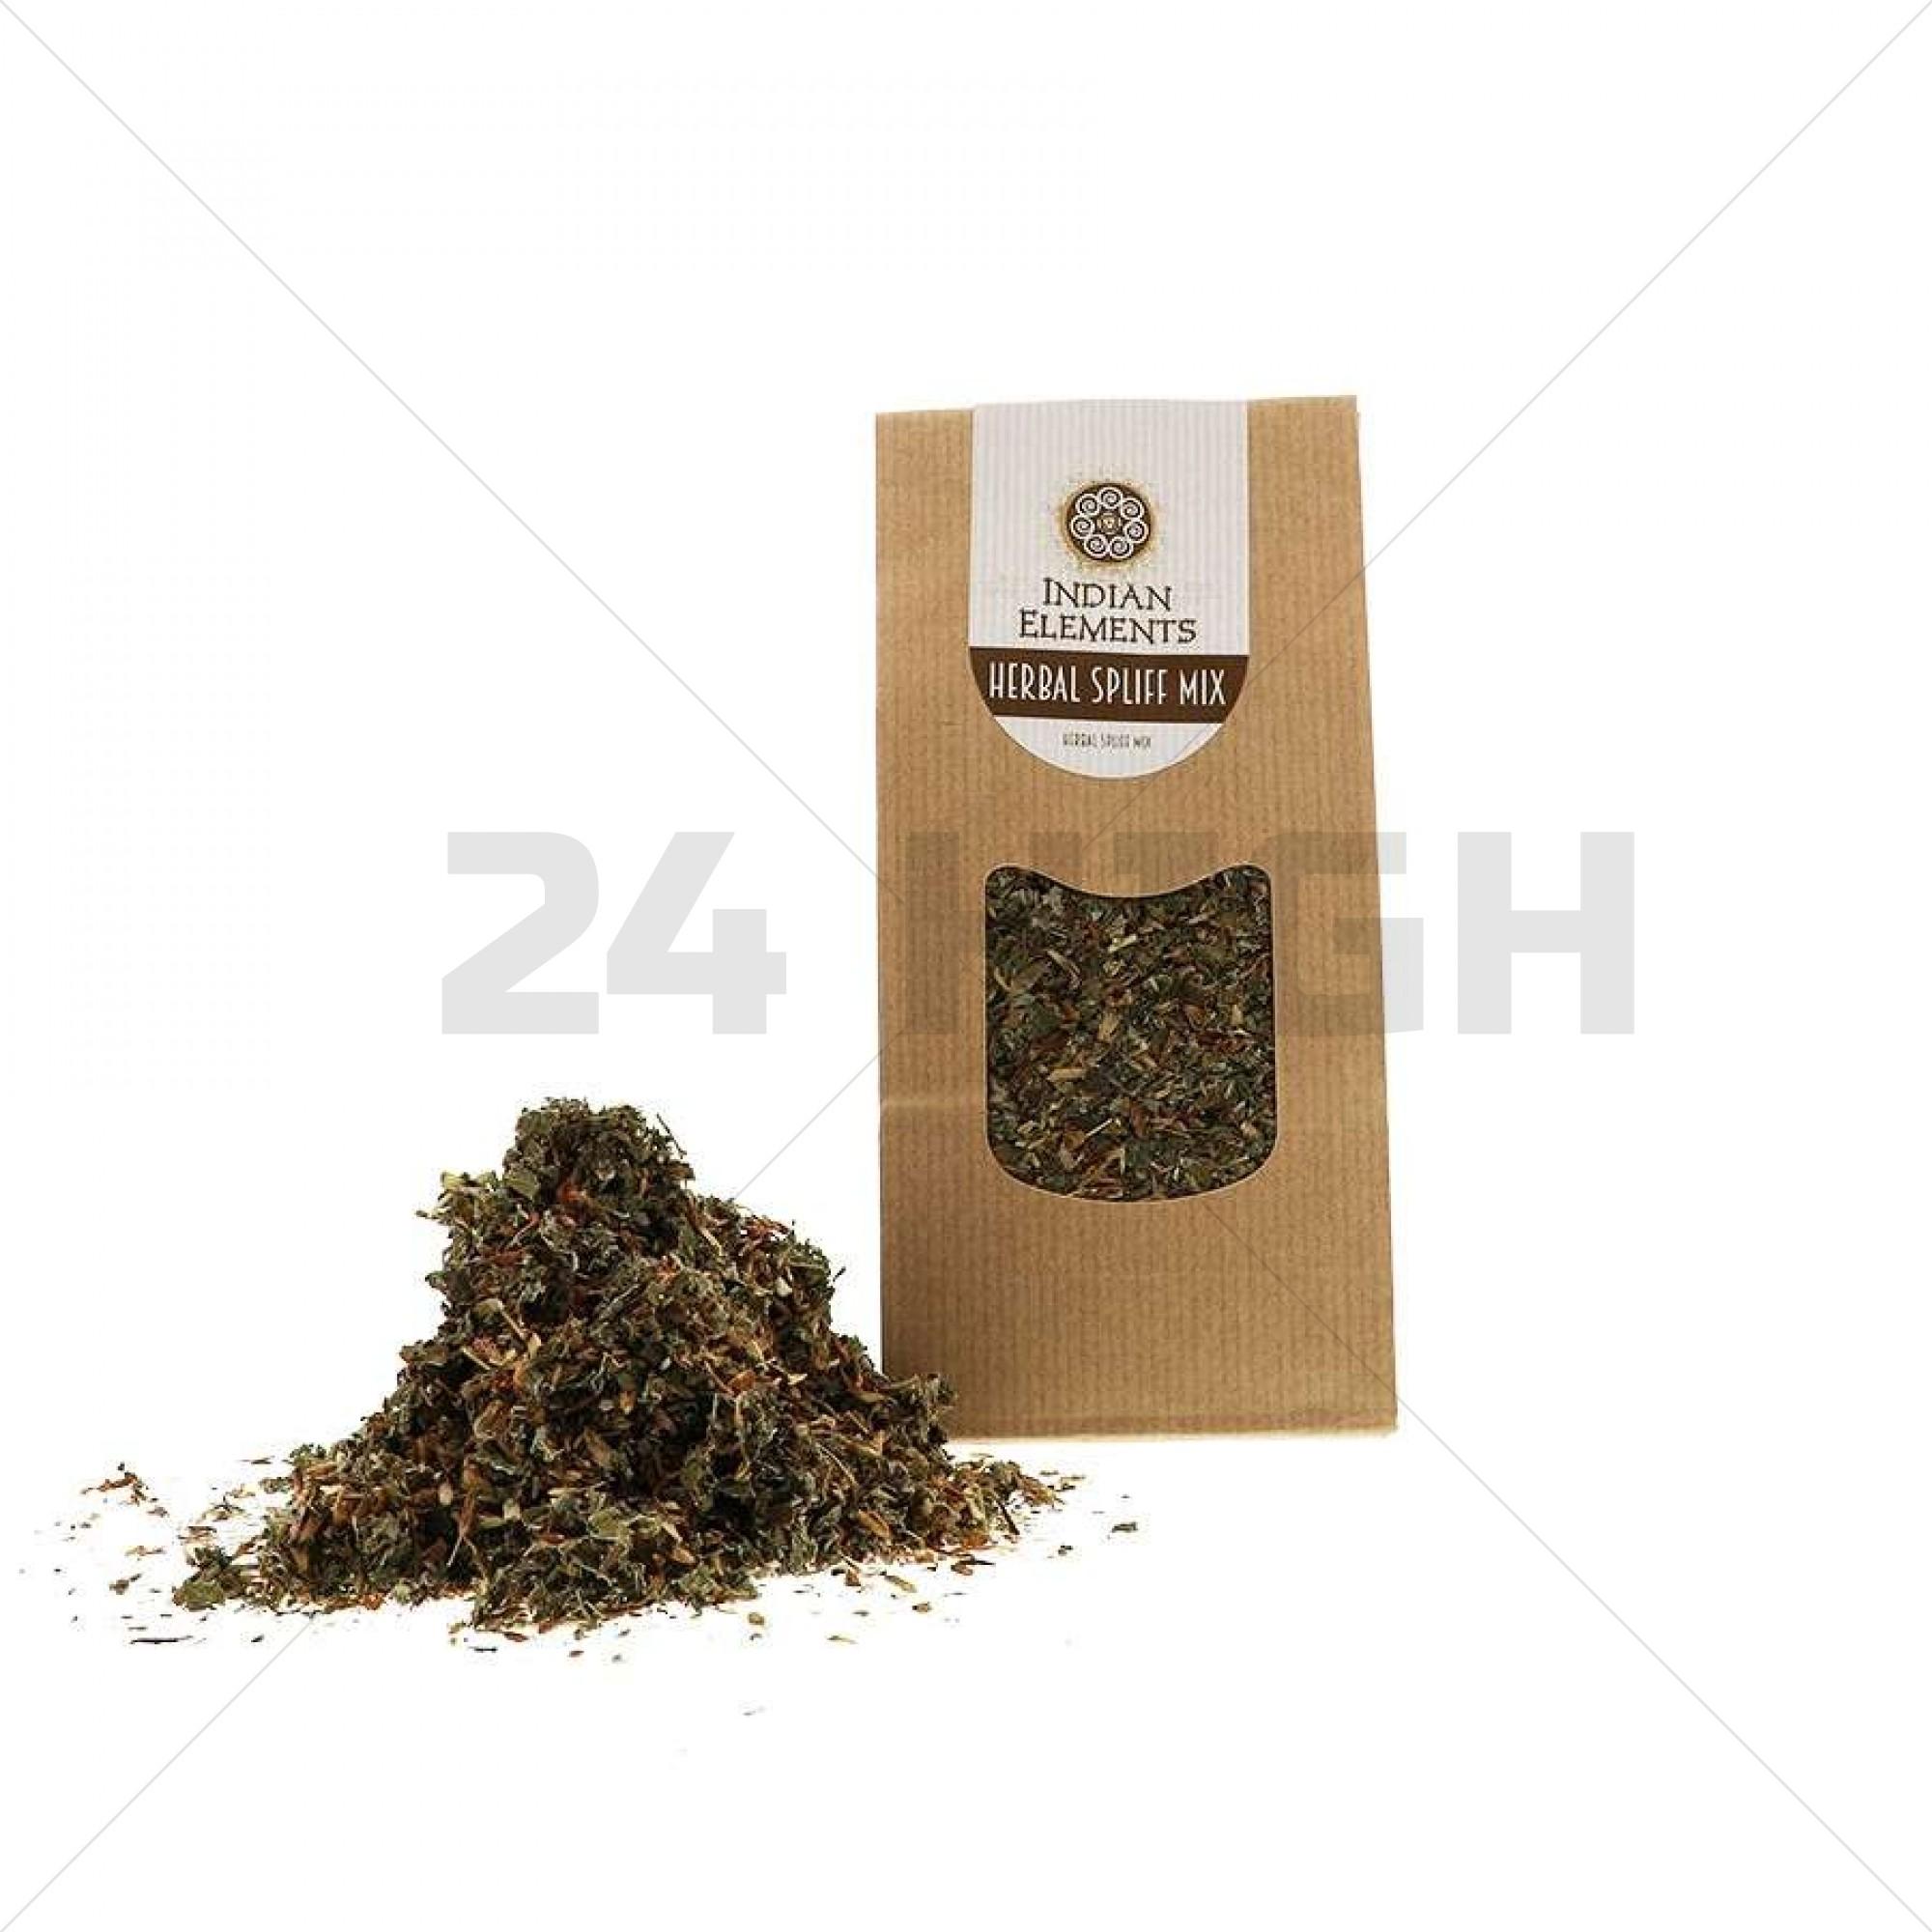 Herbal Spliff Mix Indian Elements